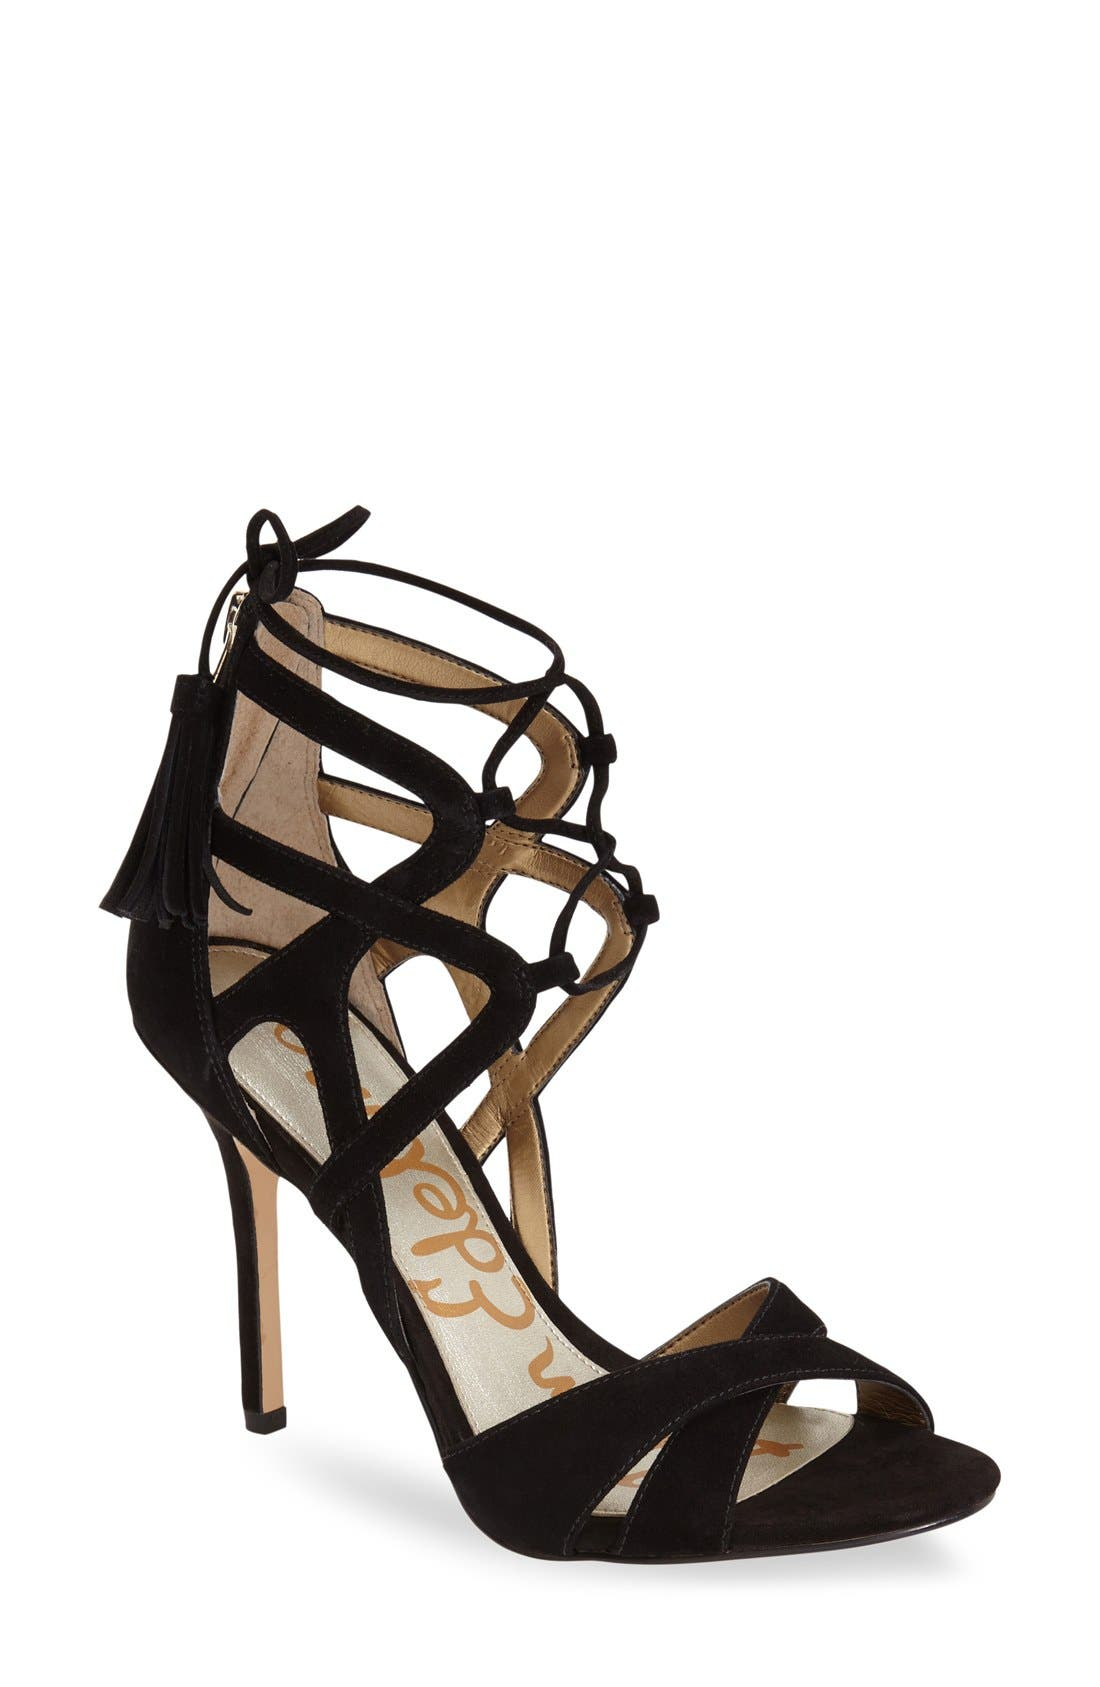 Alternate Image 1 Selected - Sam Edelman 'Azela' Tasseled Lace-Up Sandal (Women)